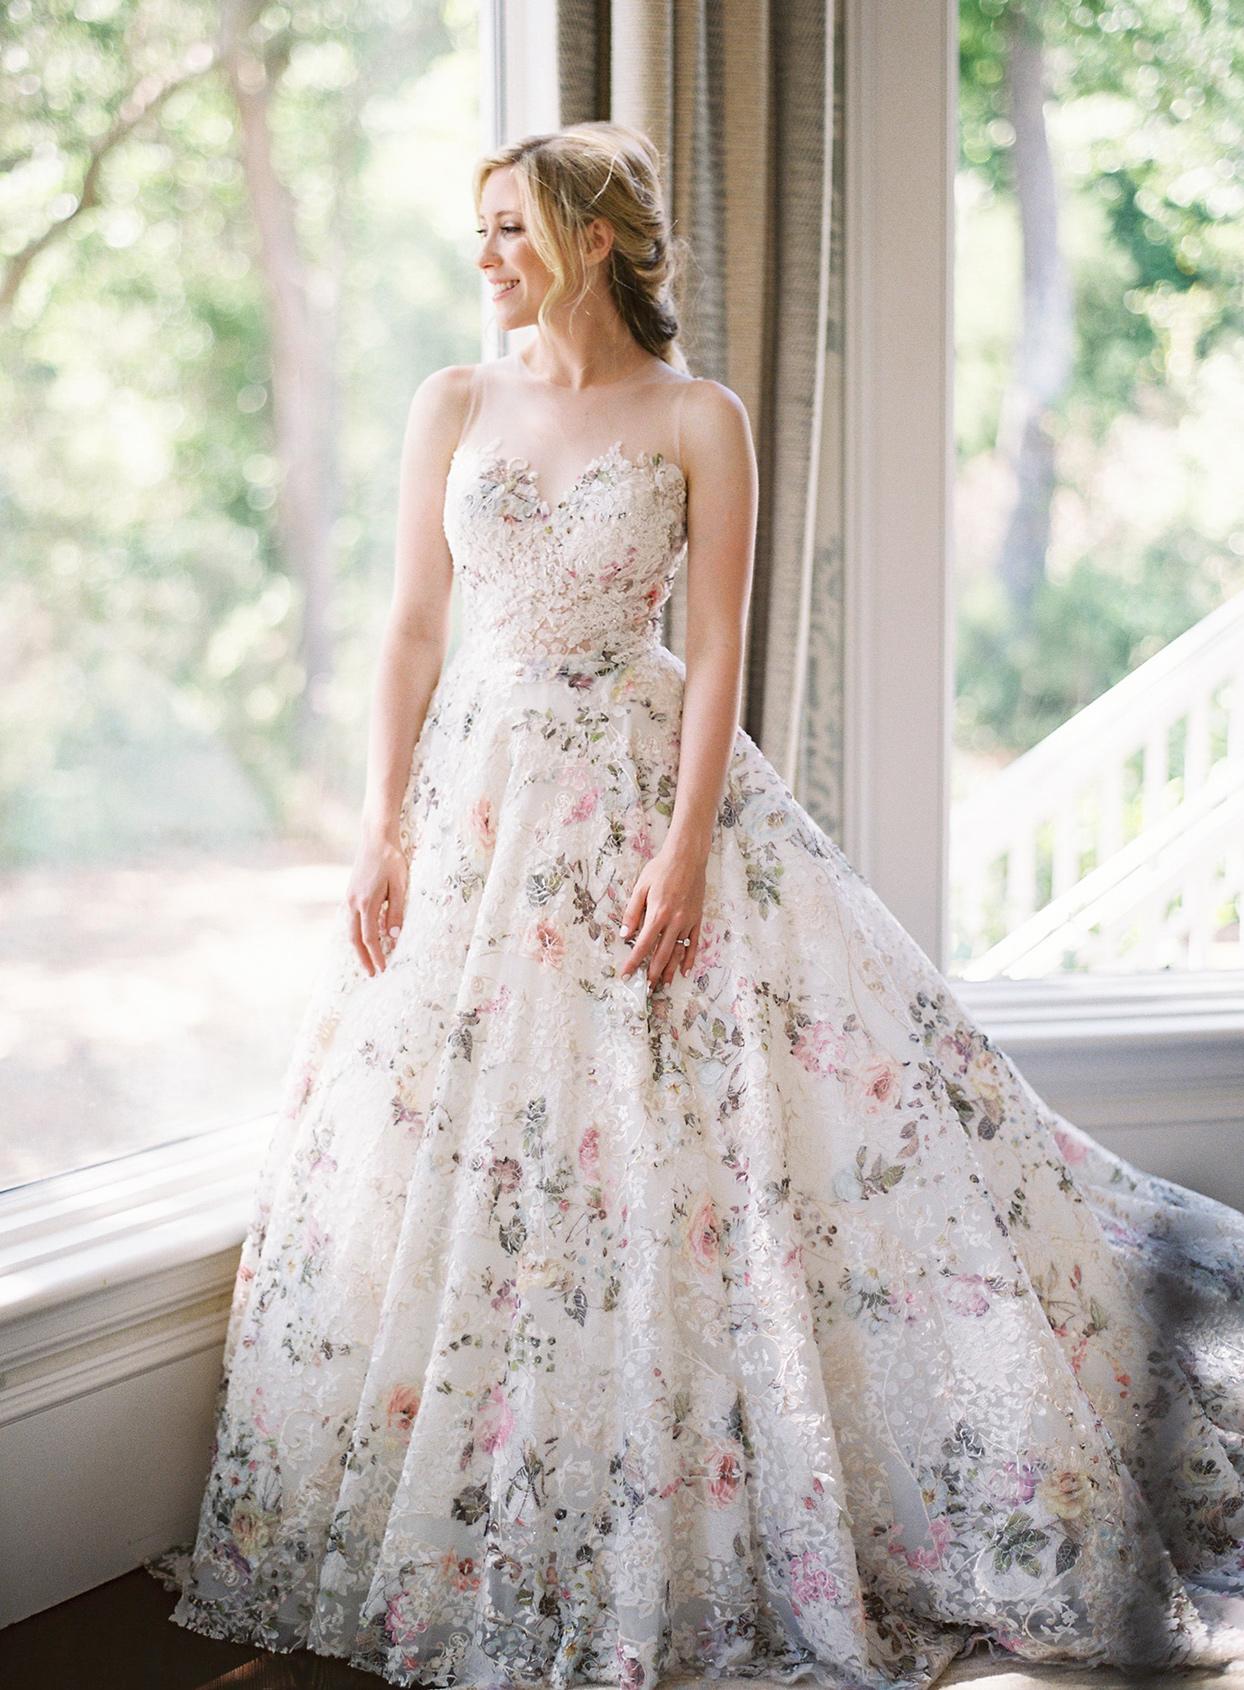 chelsea john wedding dress floral overlay